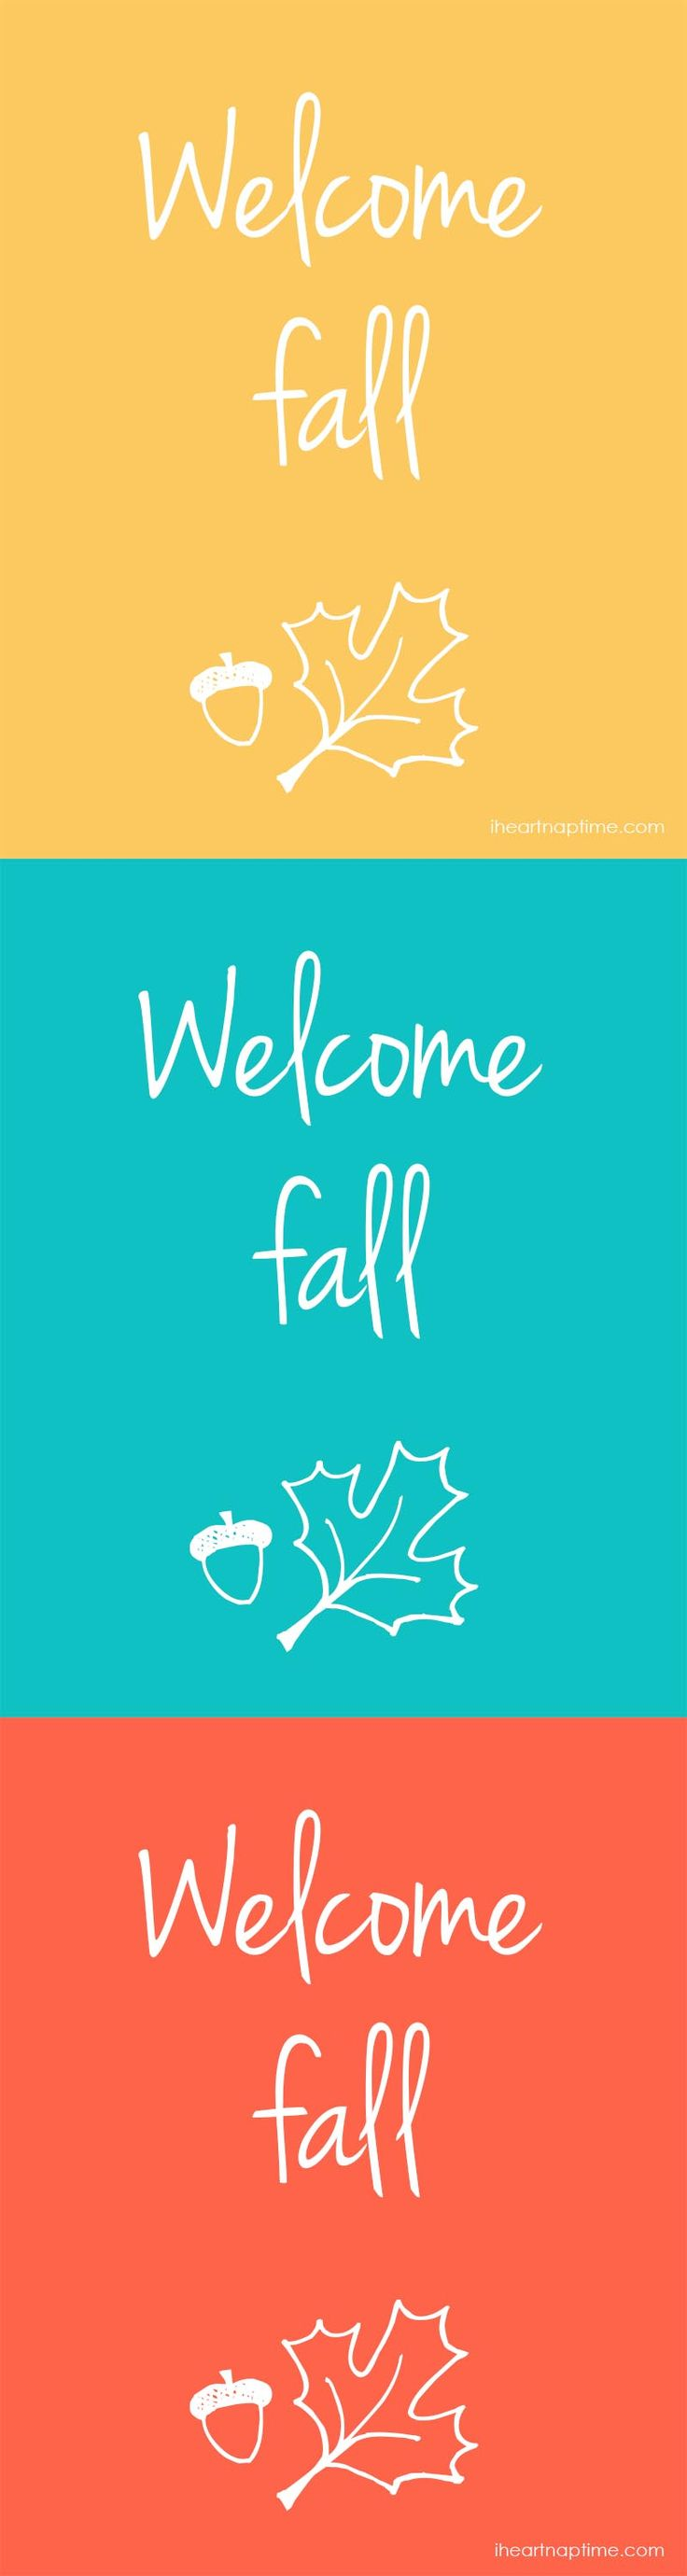 Welcome fall free printable art on iheartnaptime.com ♥